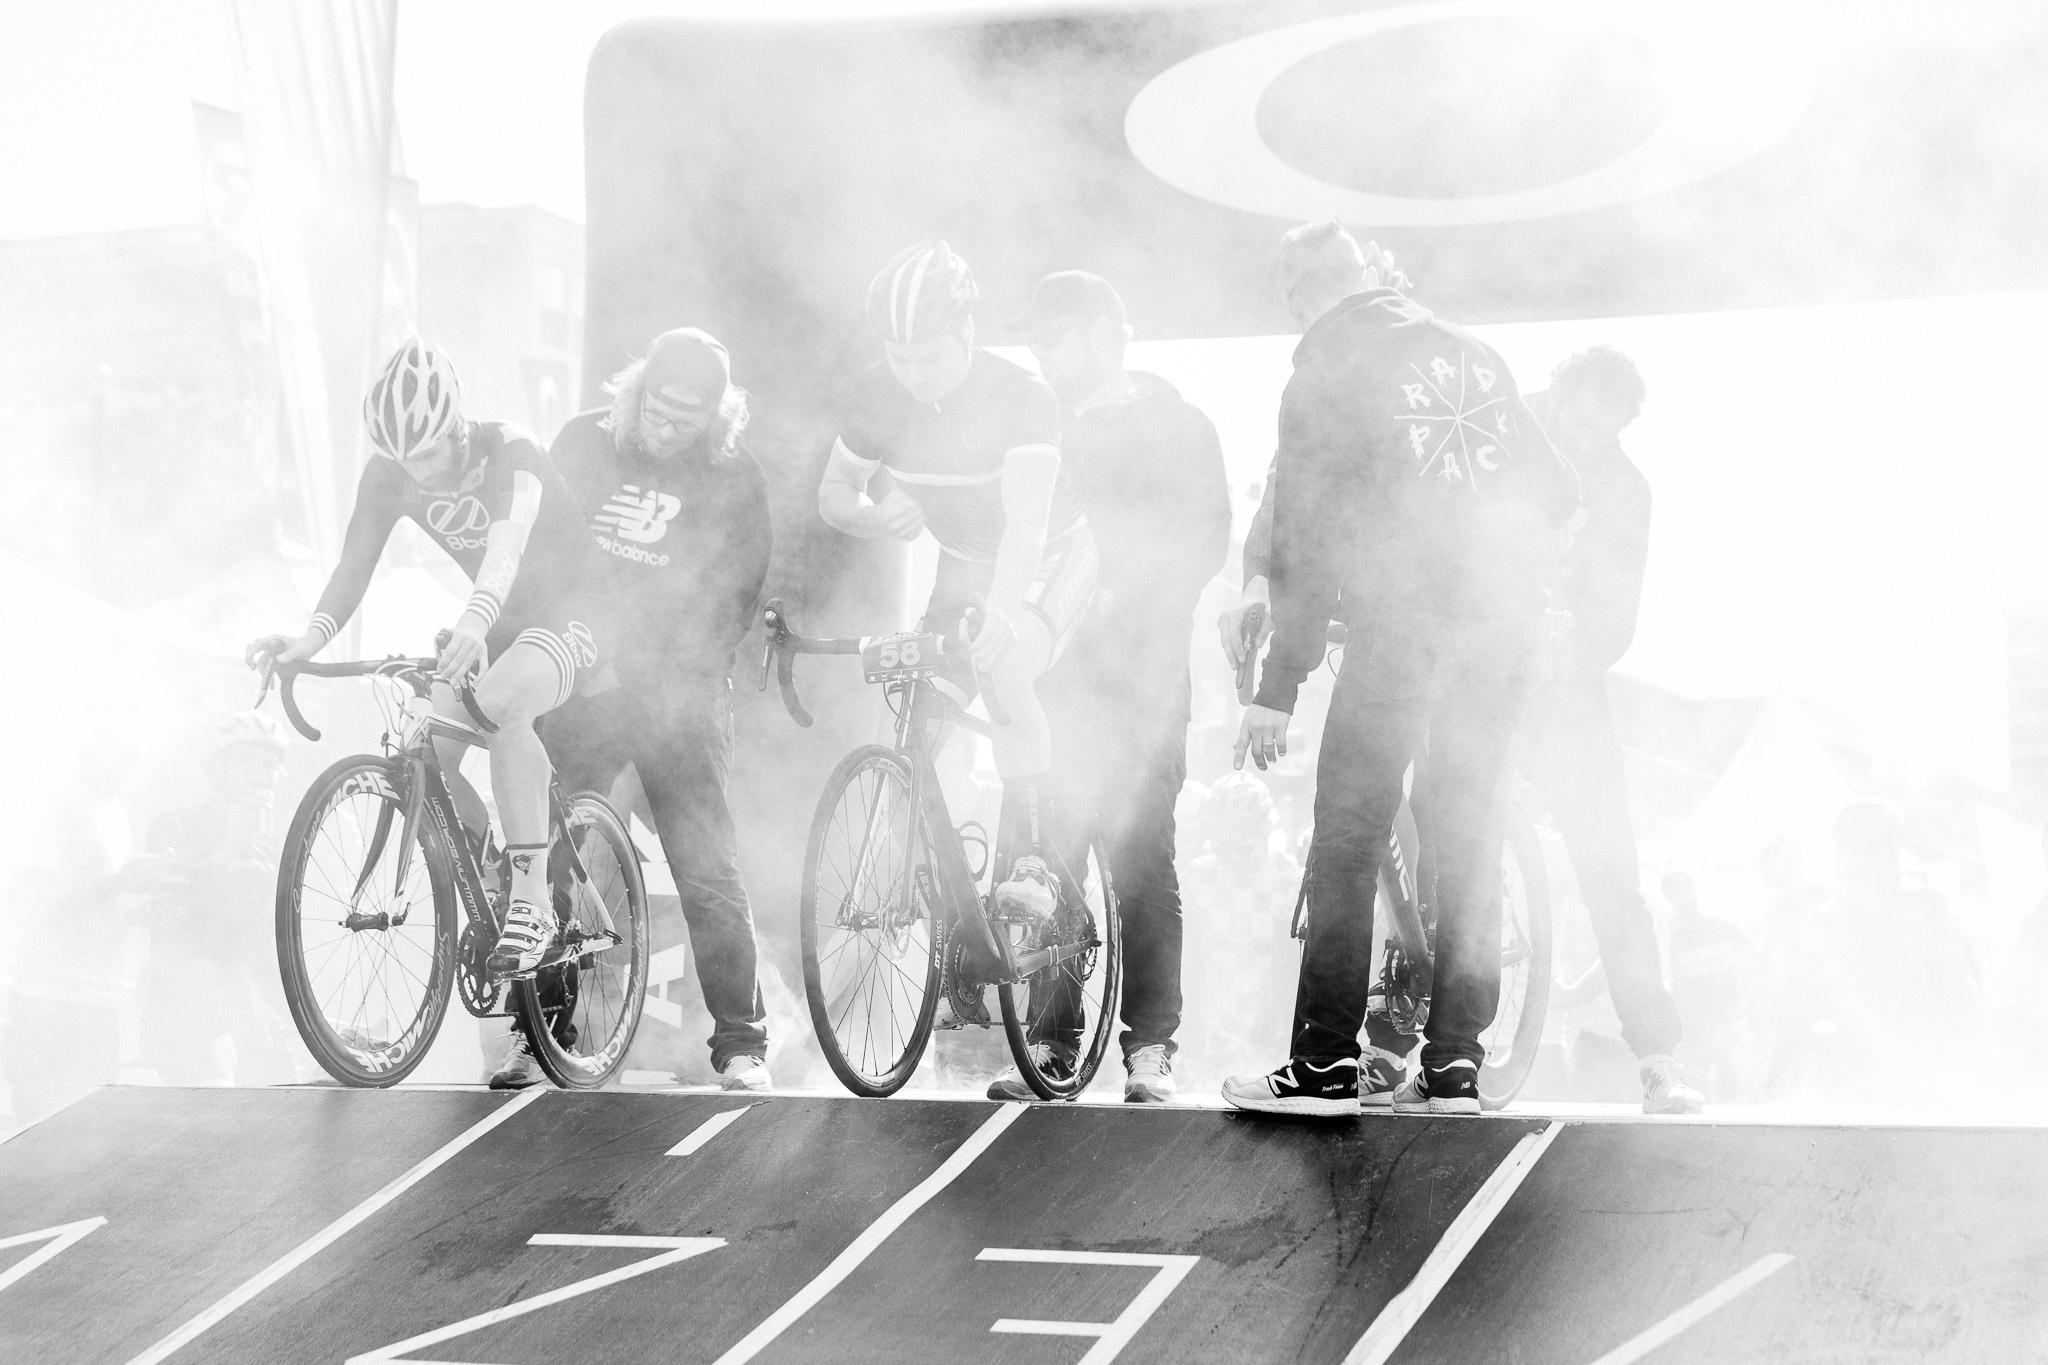 RAD RACE Battle, Berlin May 30 2015 Photo by Björn Lexius_07.jpg